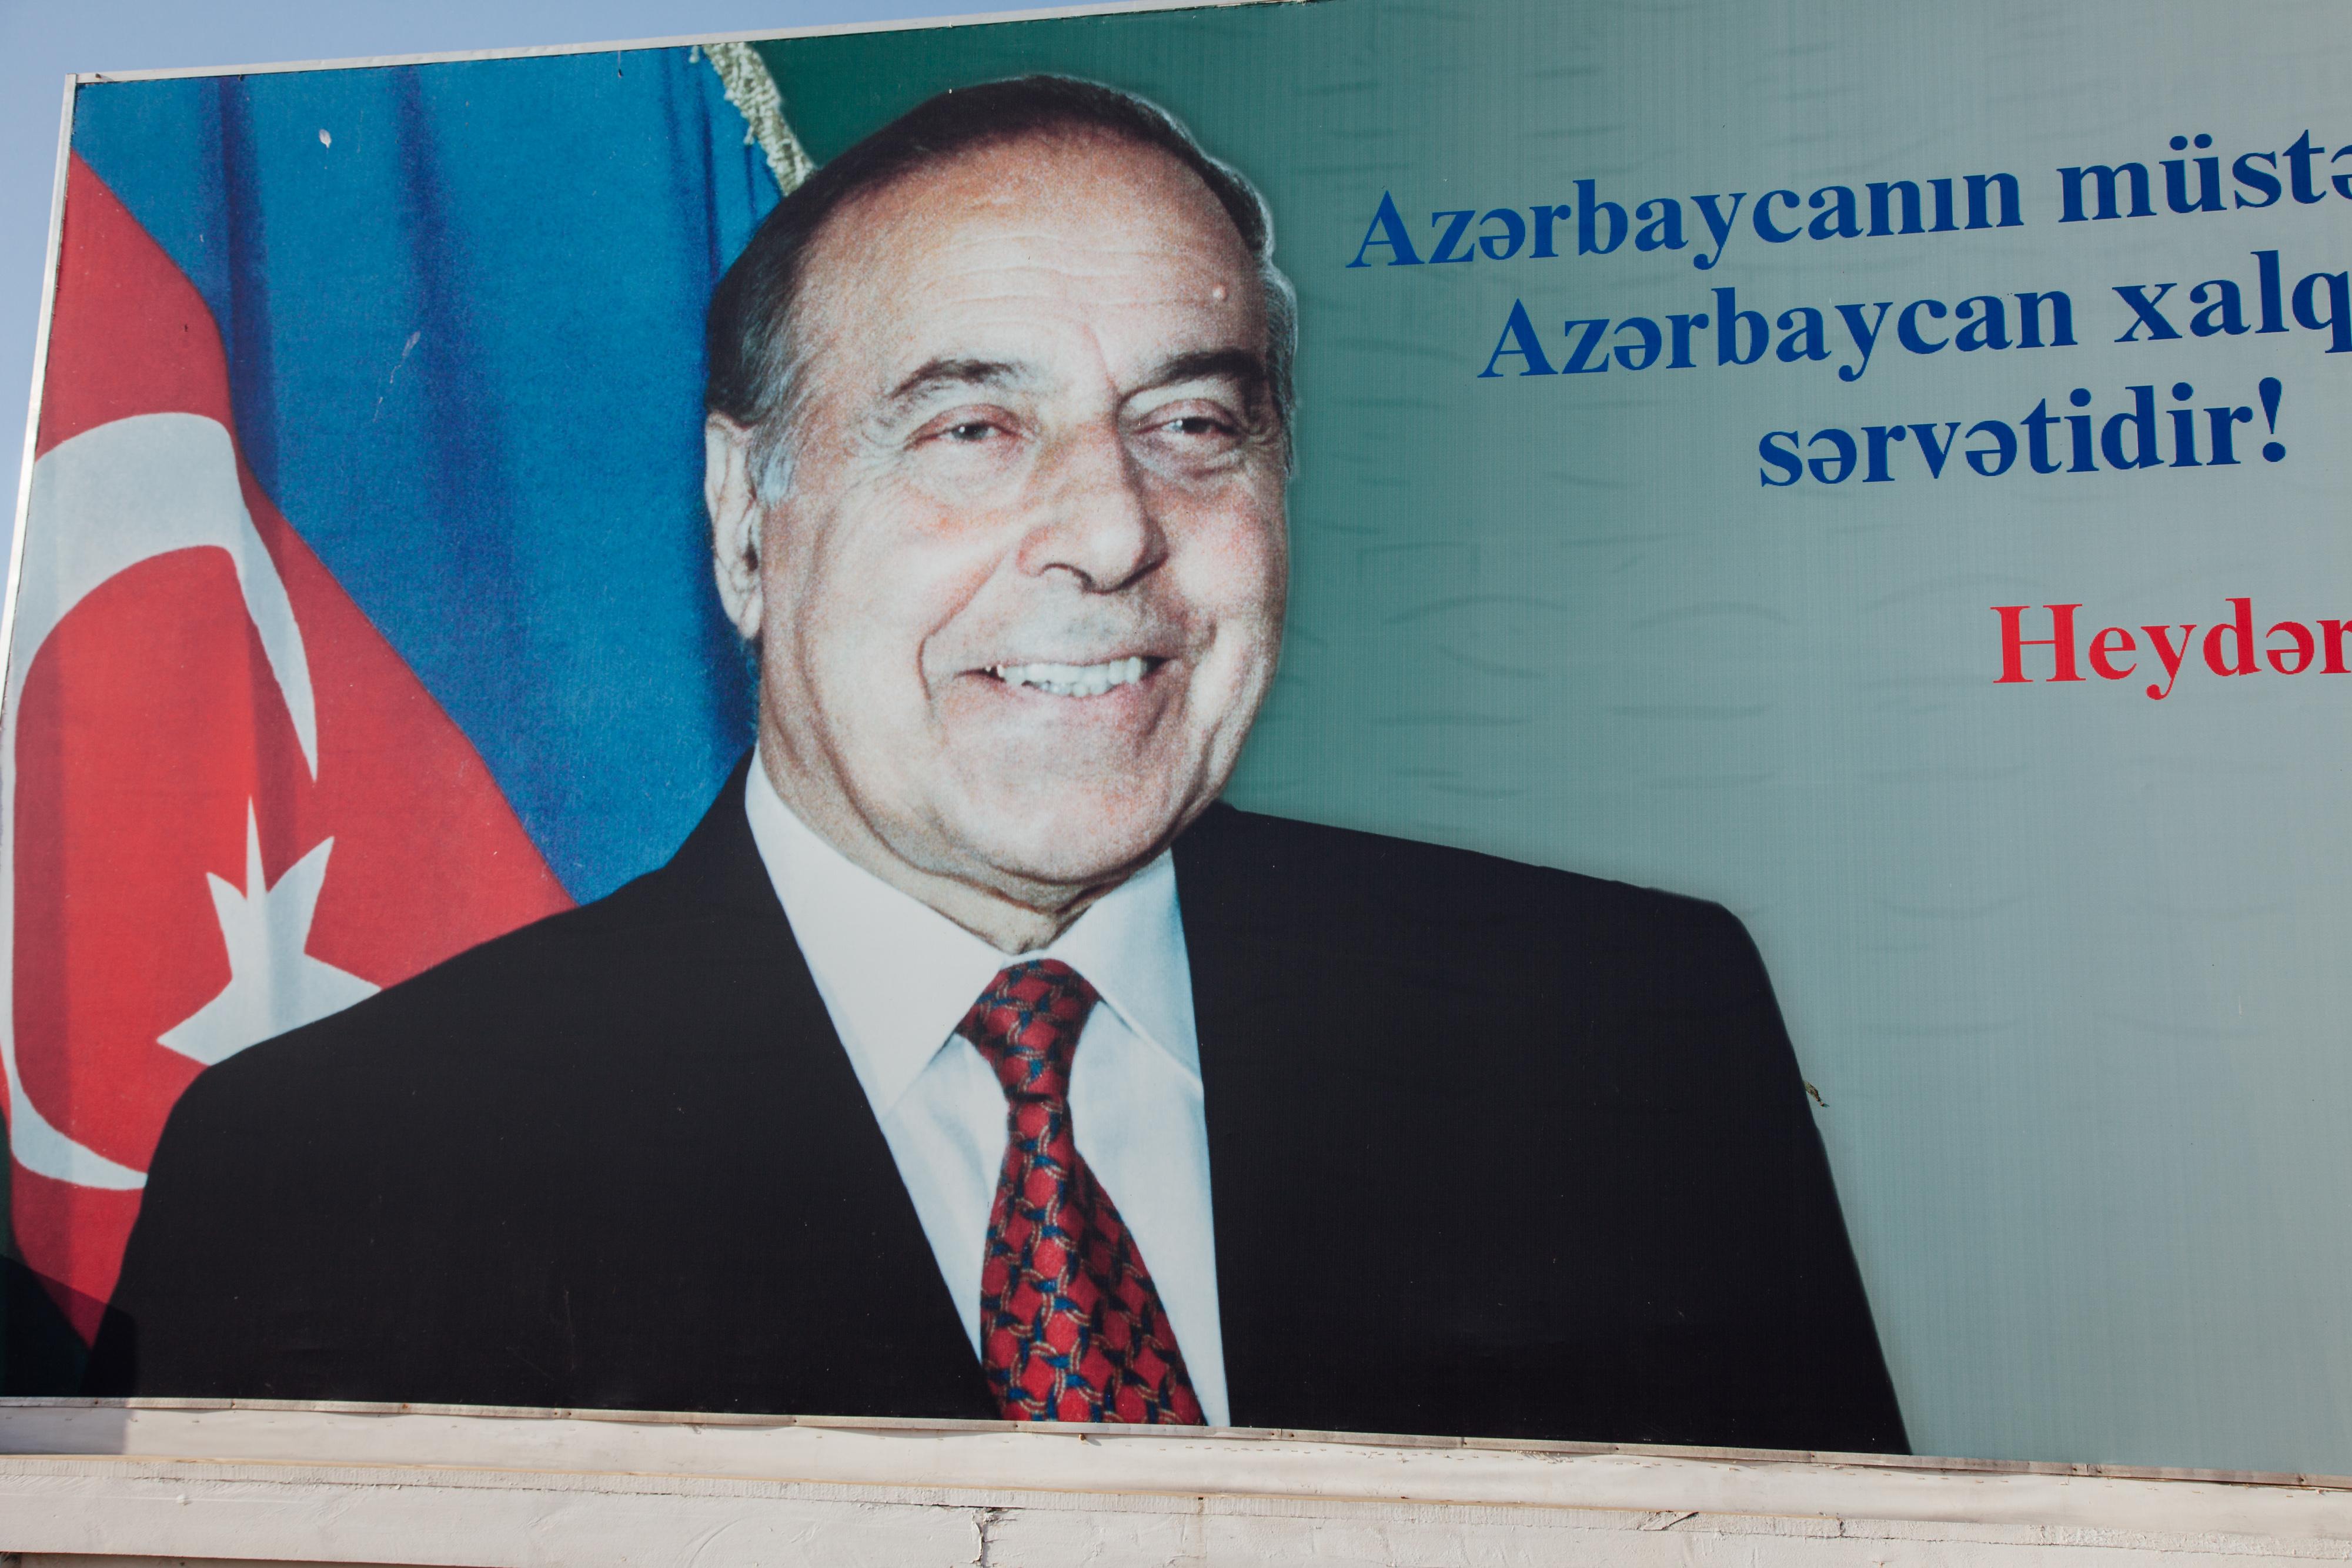 IMG_7055_Aserbaidschan_2010